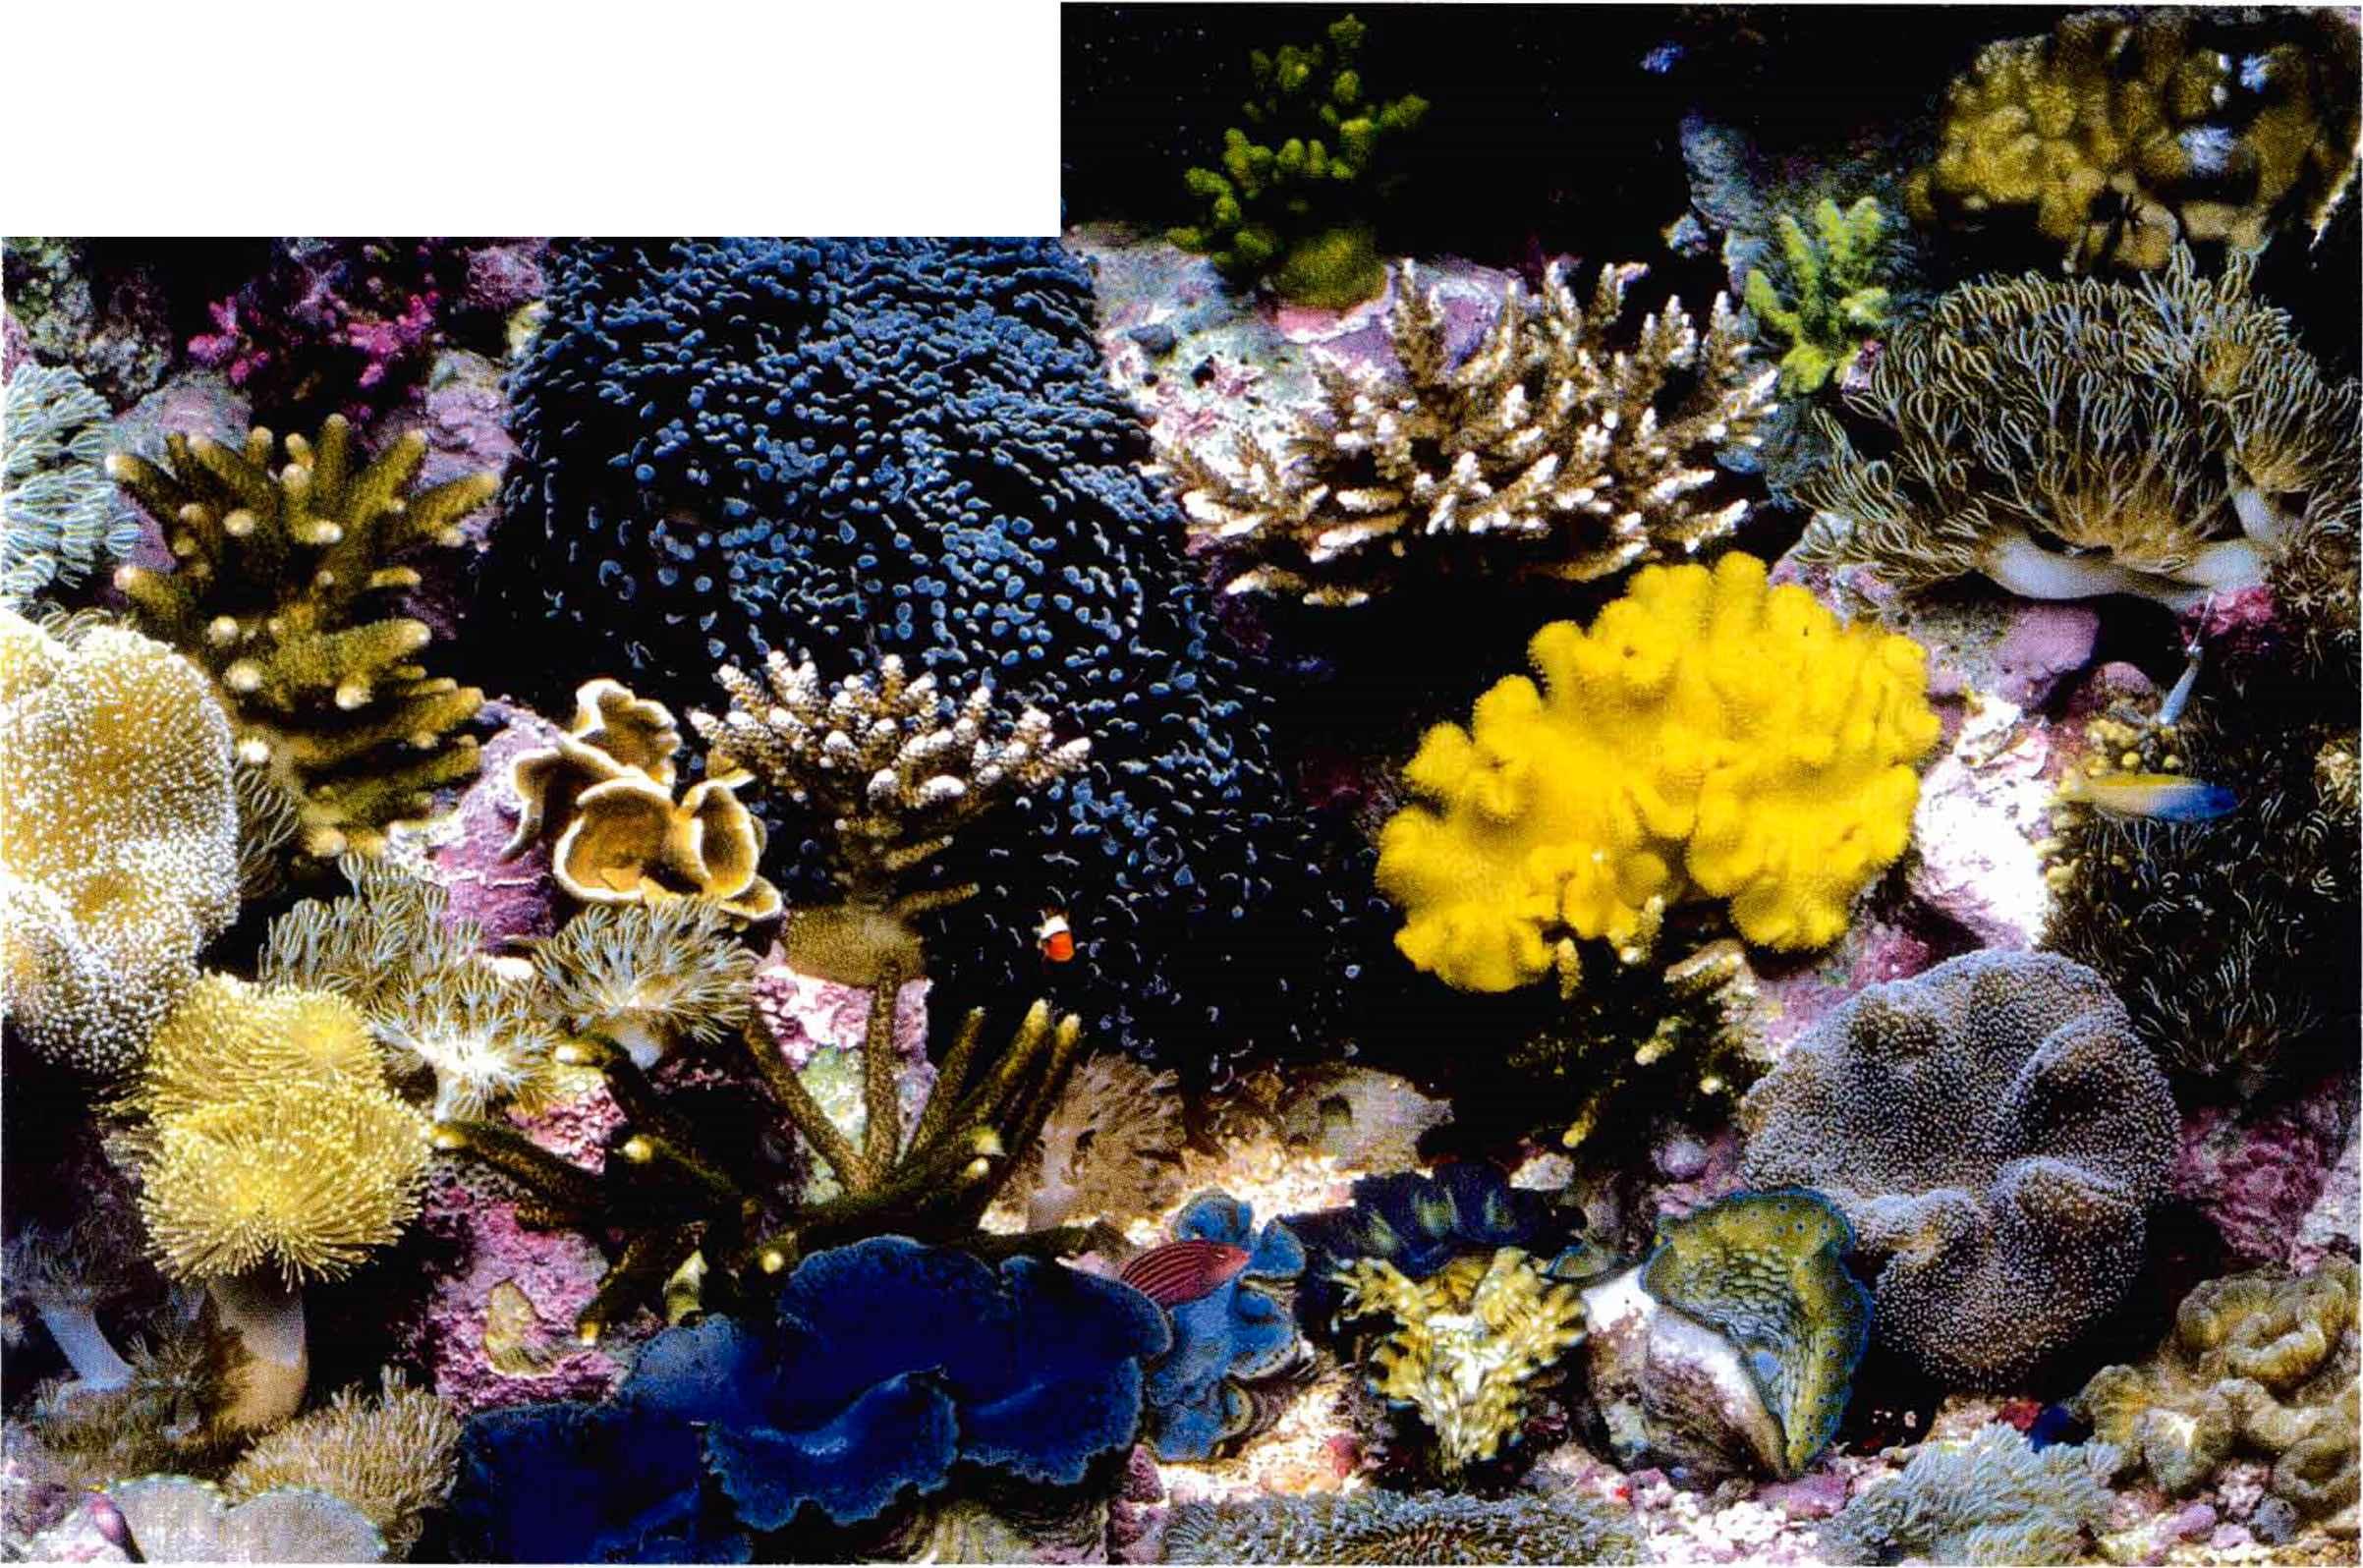 Aquarium Natural Habitat Gibell Aquarium Society border=